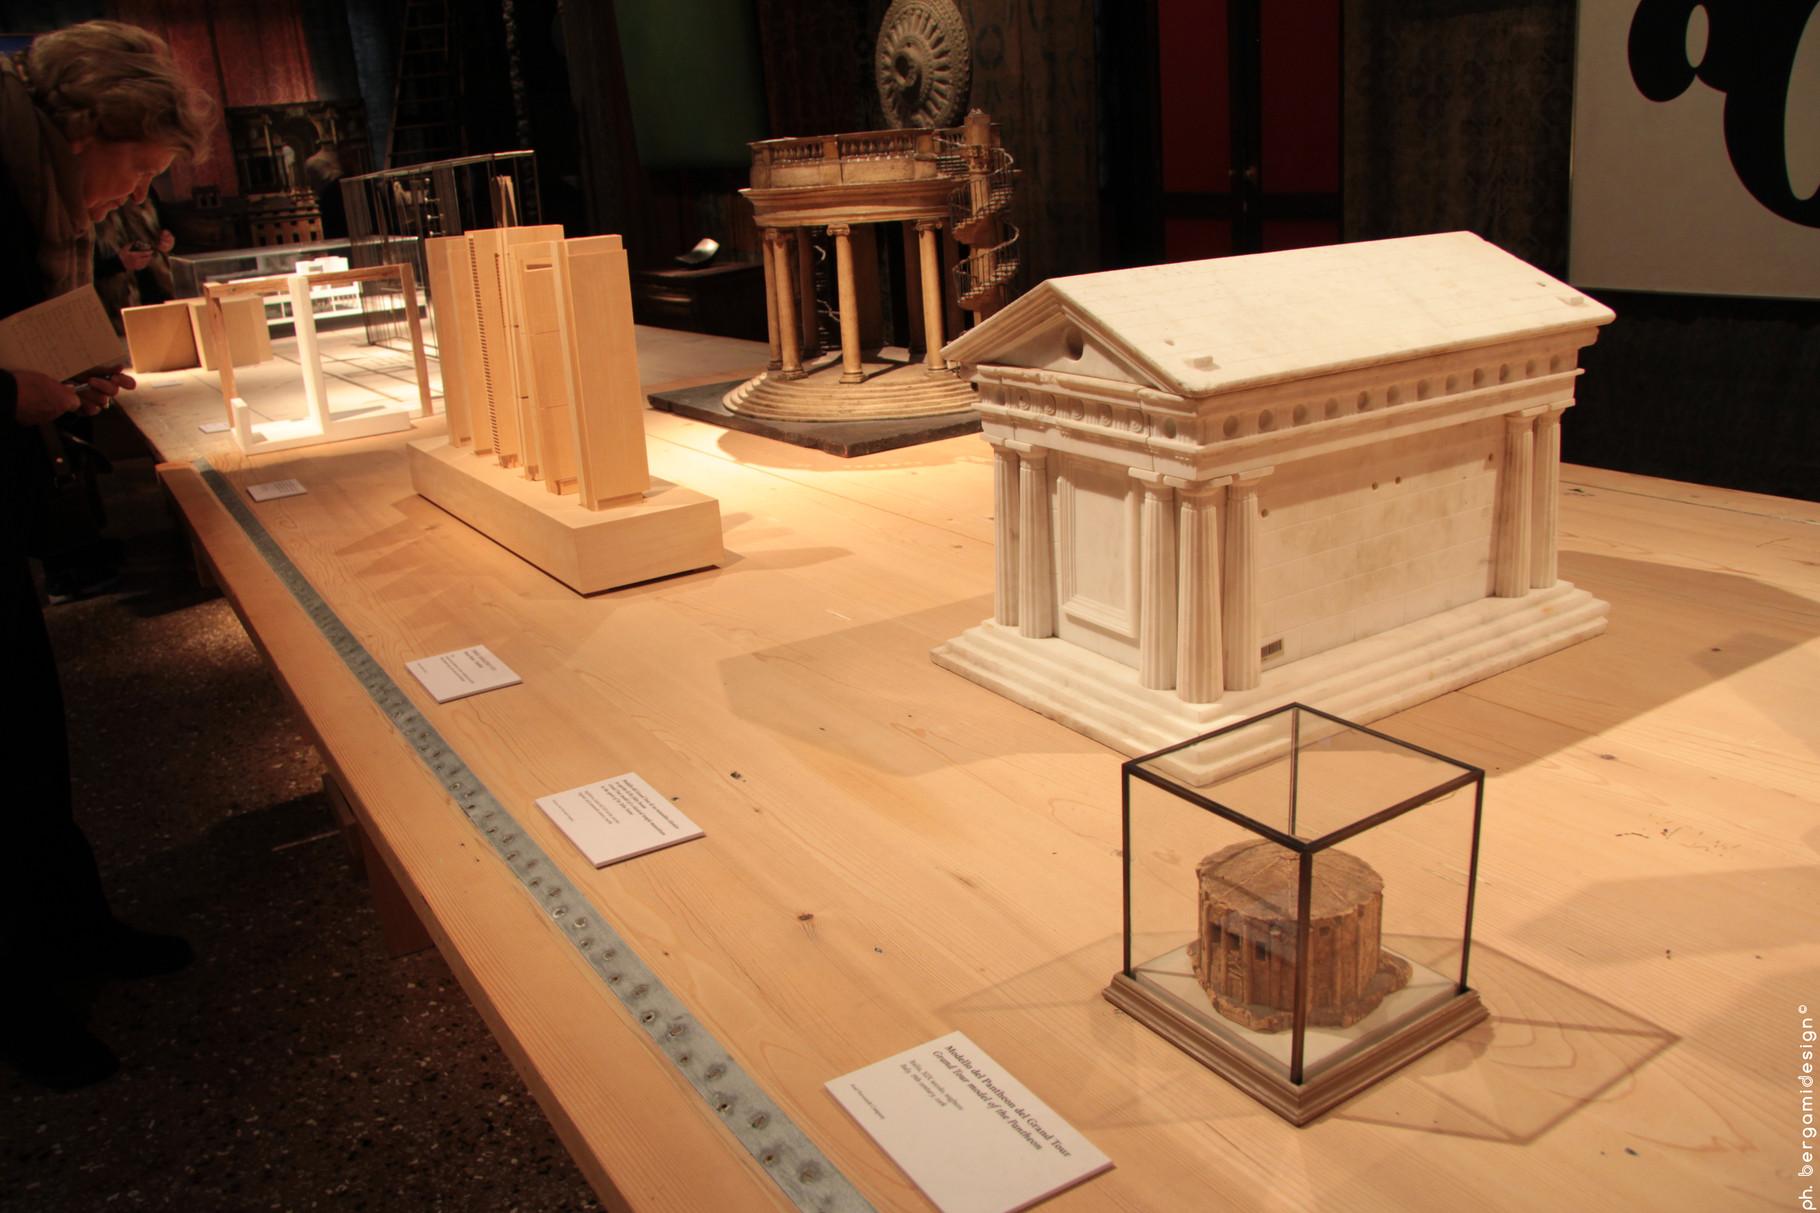 Panoramica dei modelli architettonici